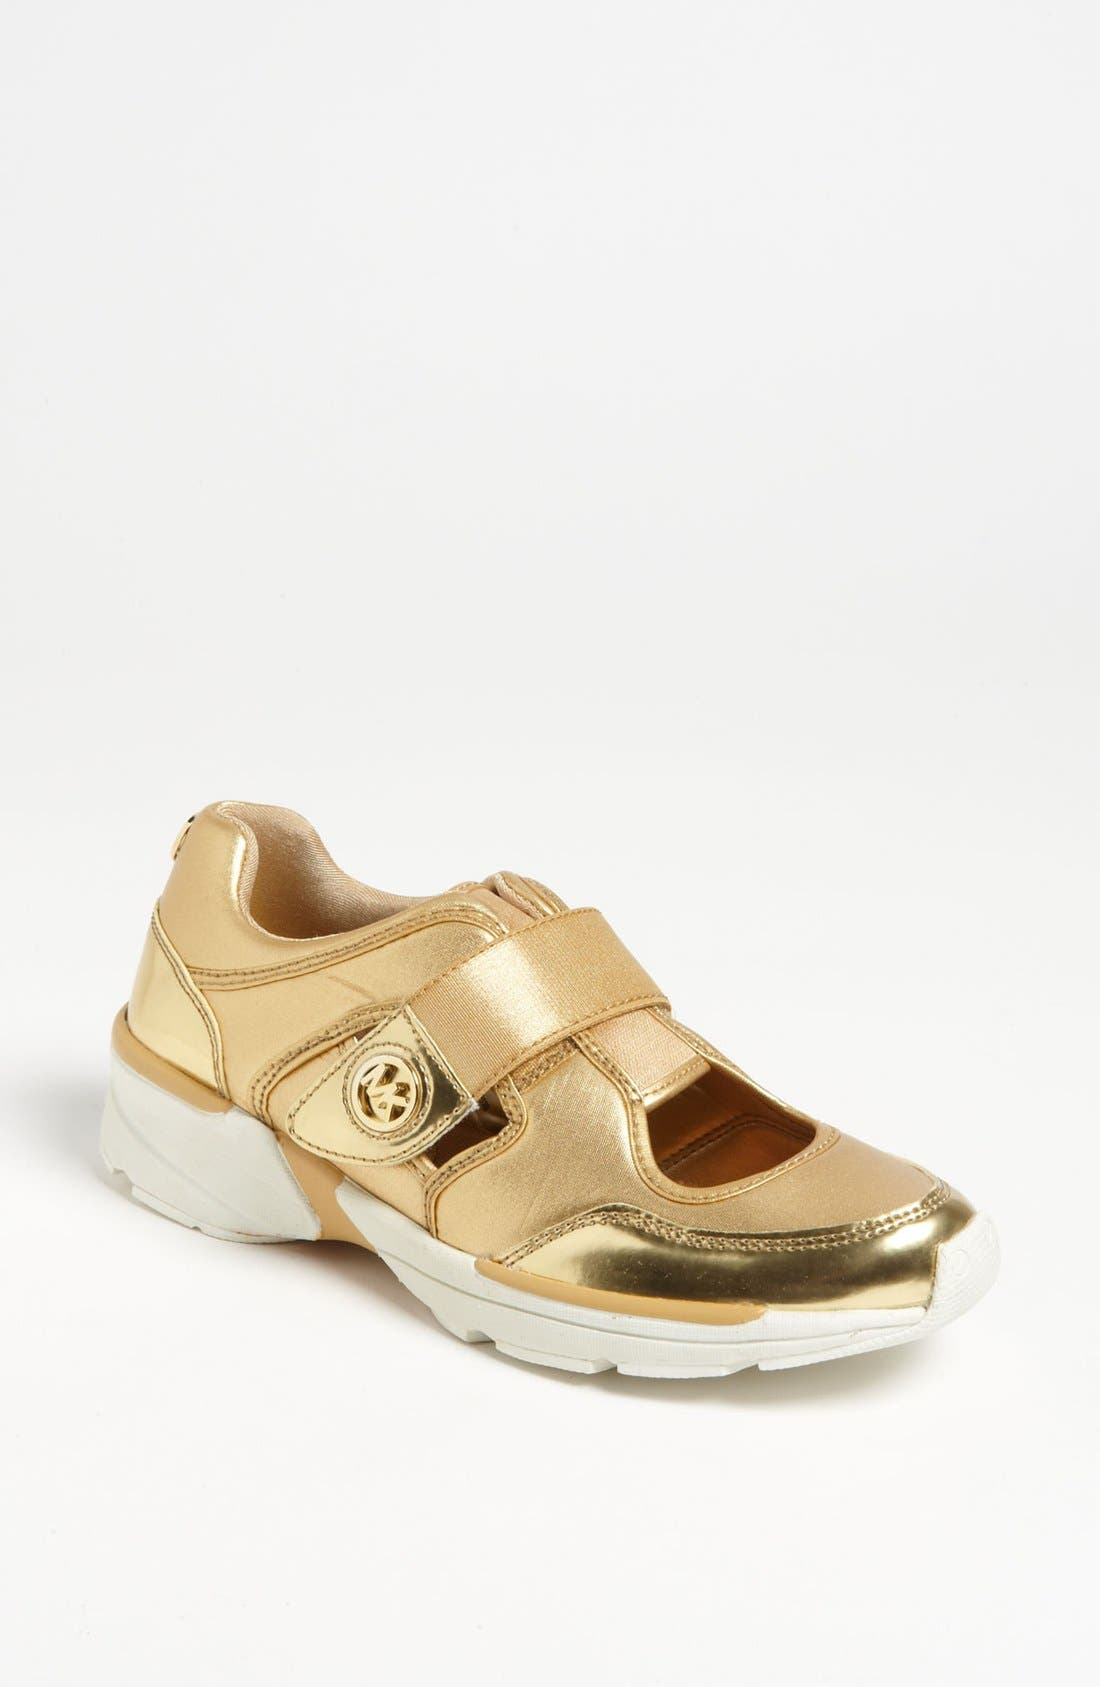 Main Image - MICHAEL Michael Kors 'Walker' Cutout Sneaker